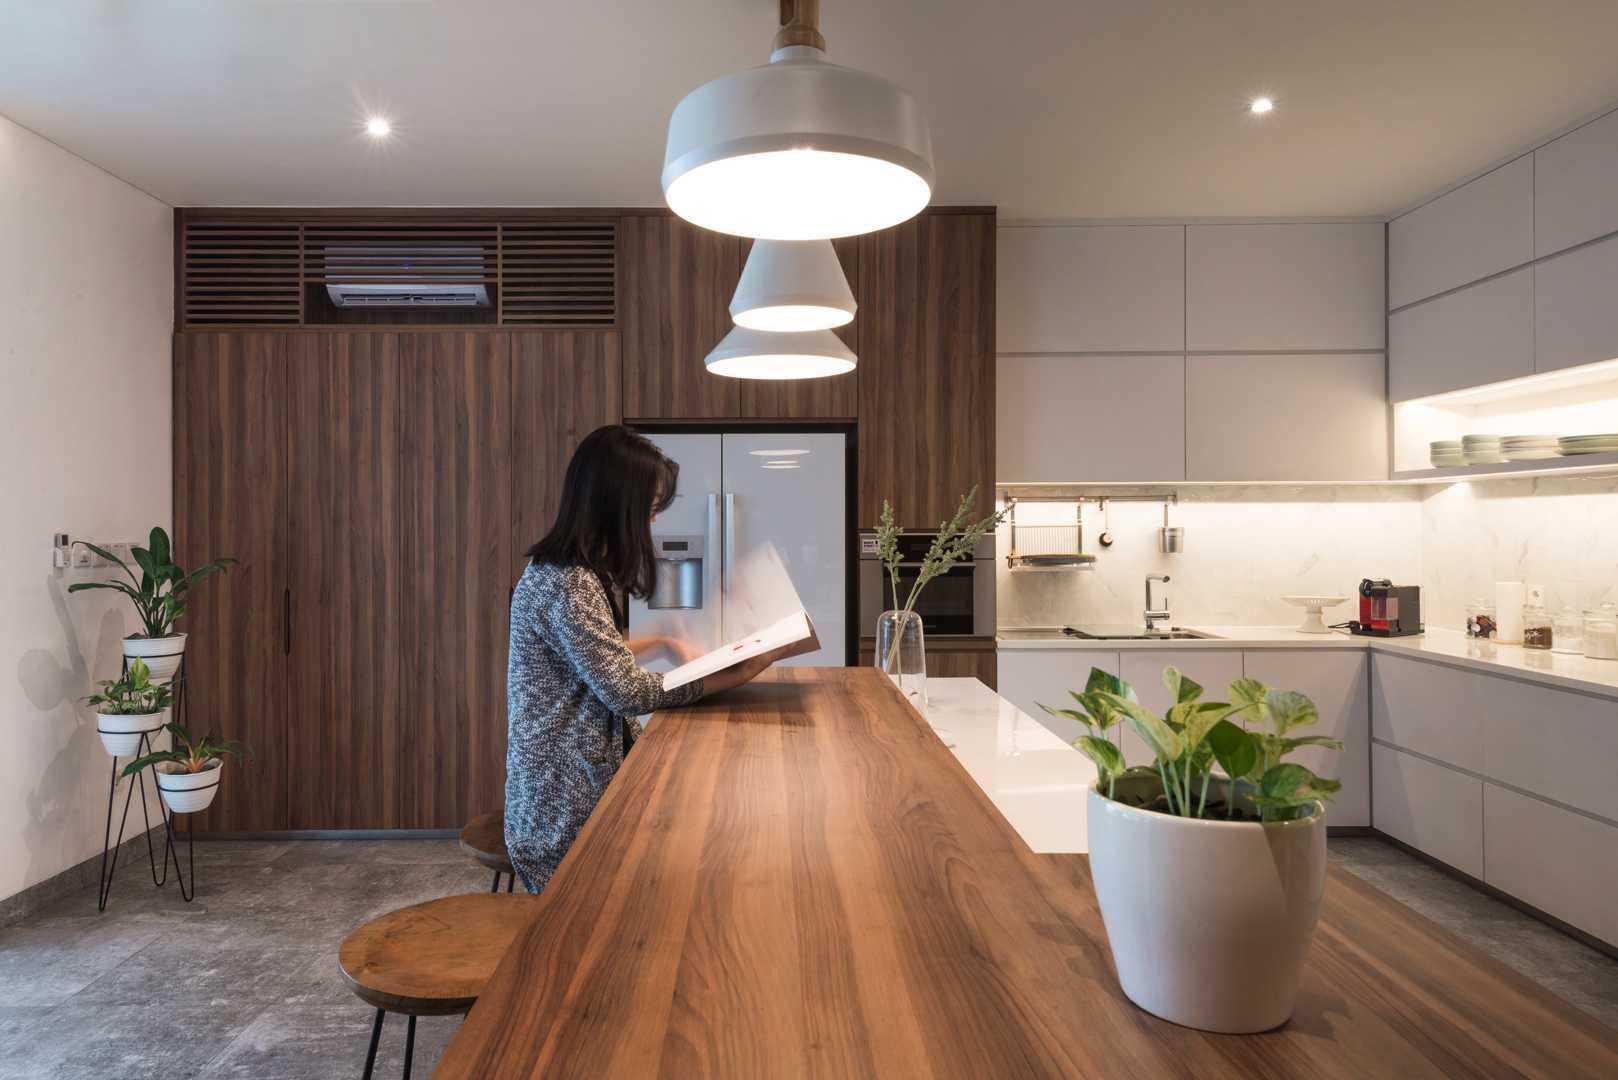 Kitchen island yang simple, fungsional, namun elegan (Sumber: arsitag.com)